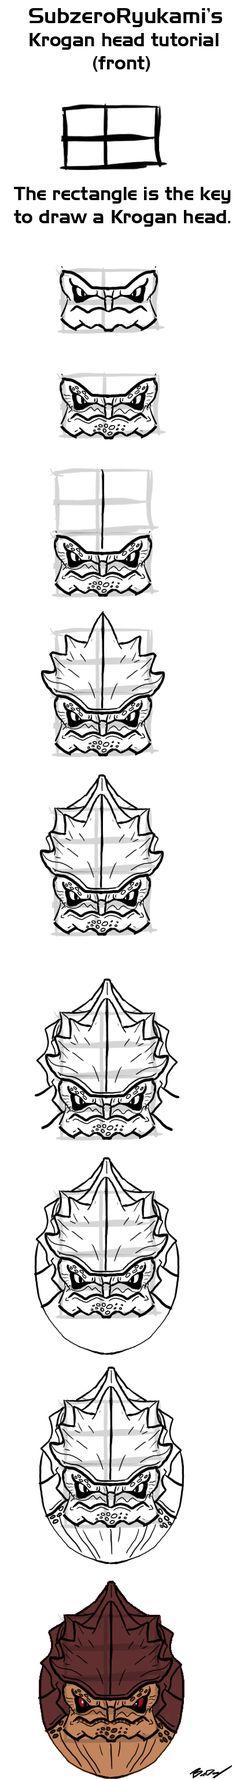 Krogan head (front) tutorial by Subzero-Ryukami.deviantart.com on @deviantART